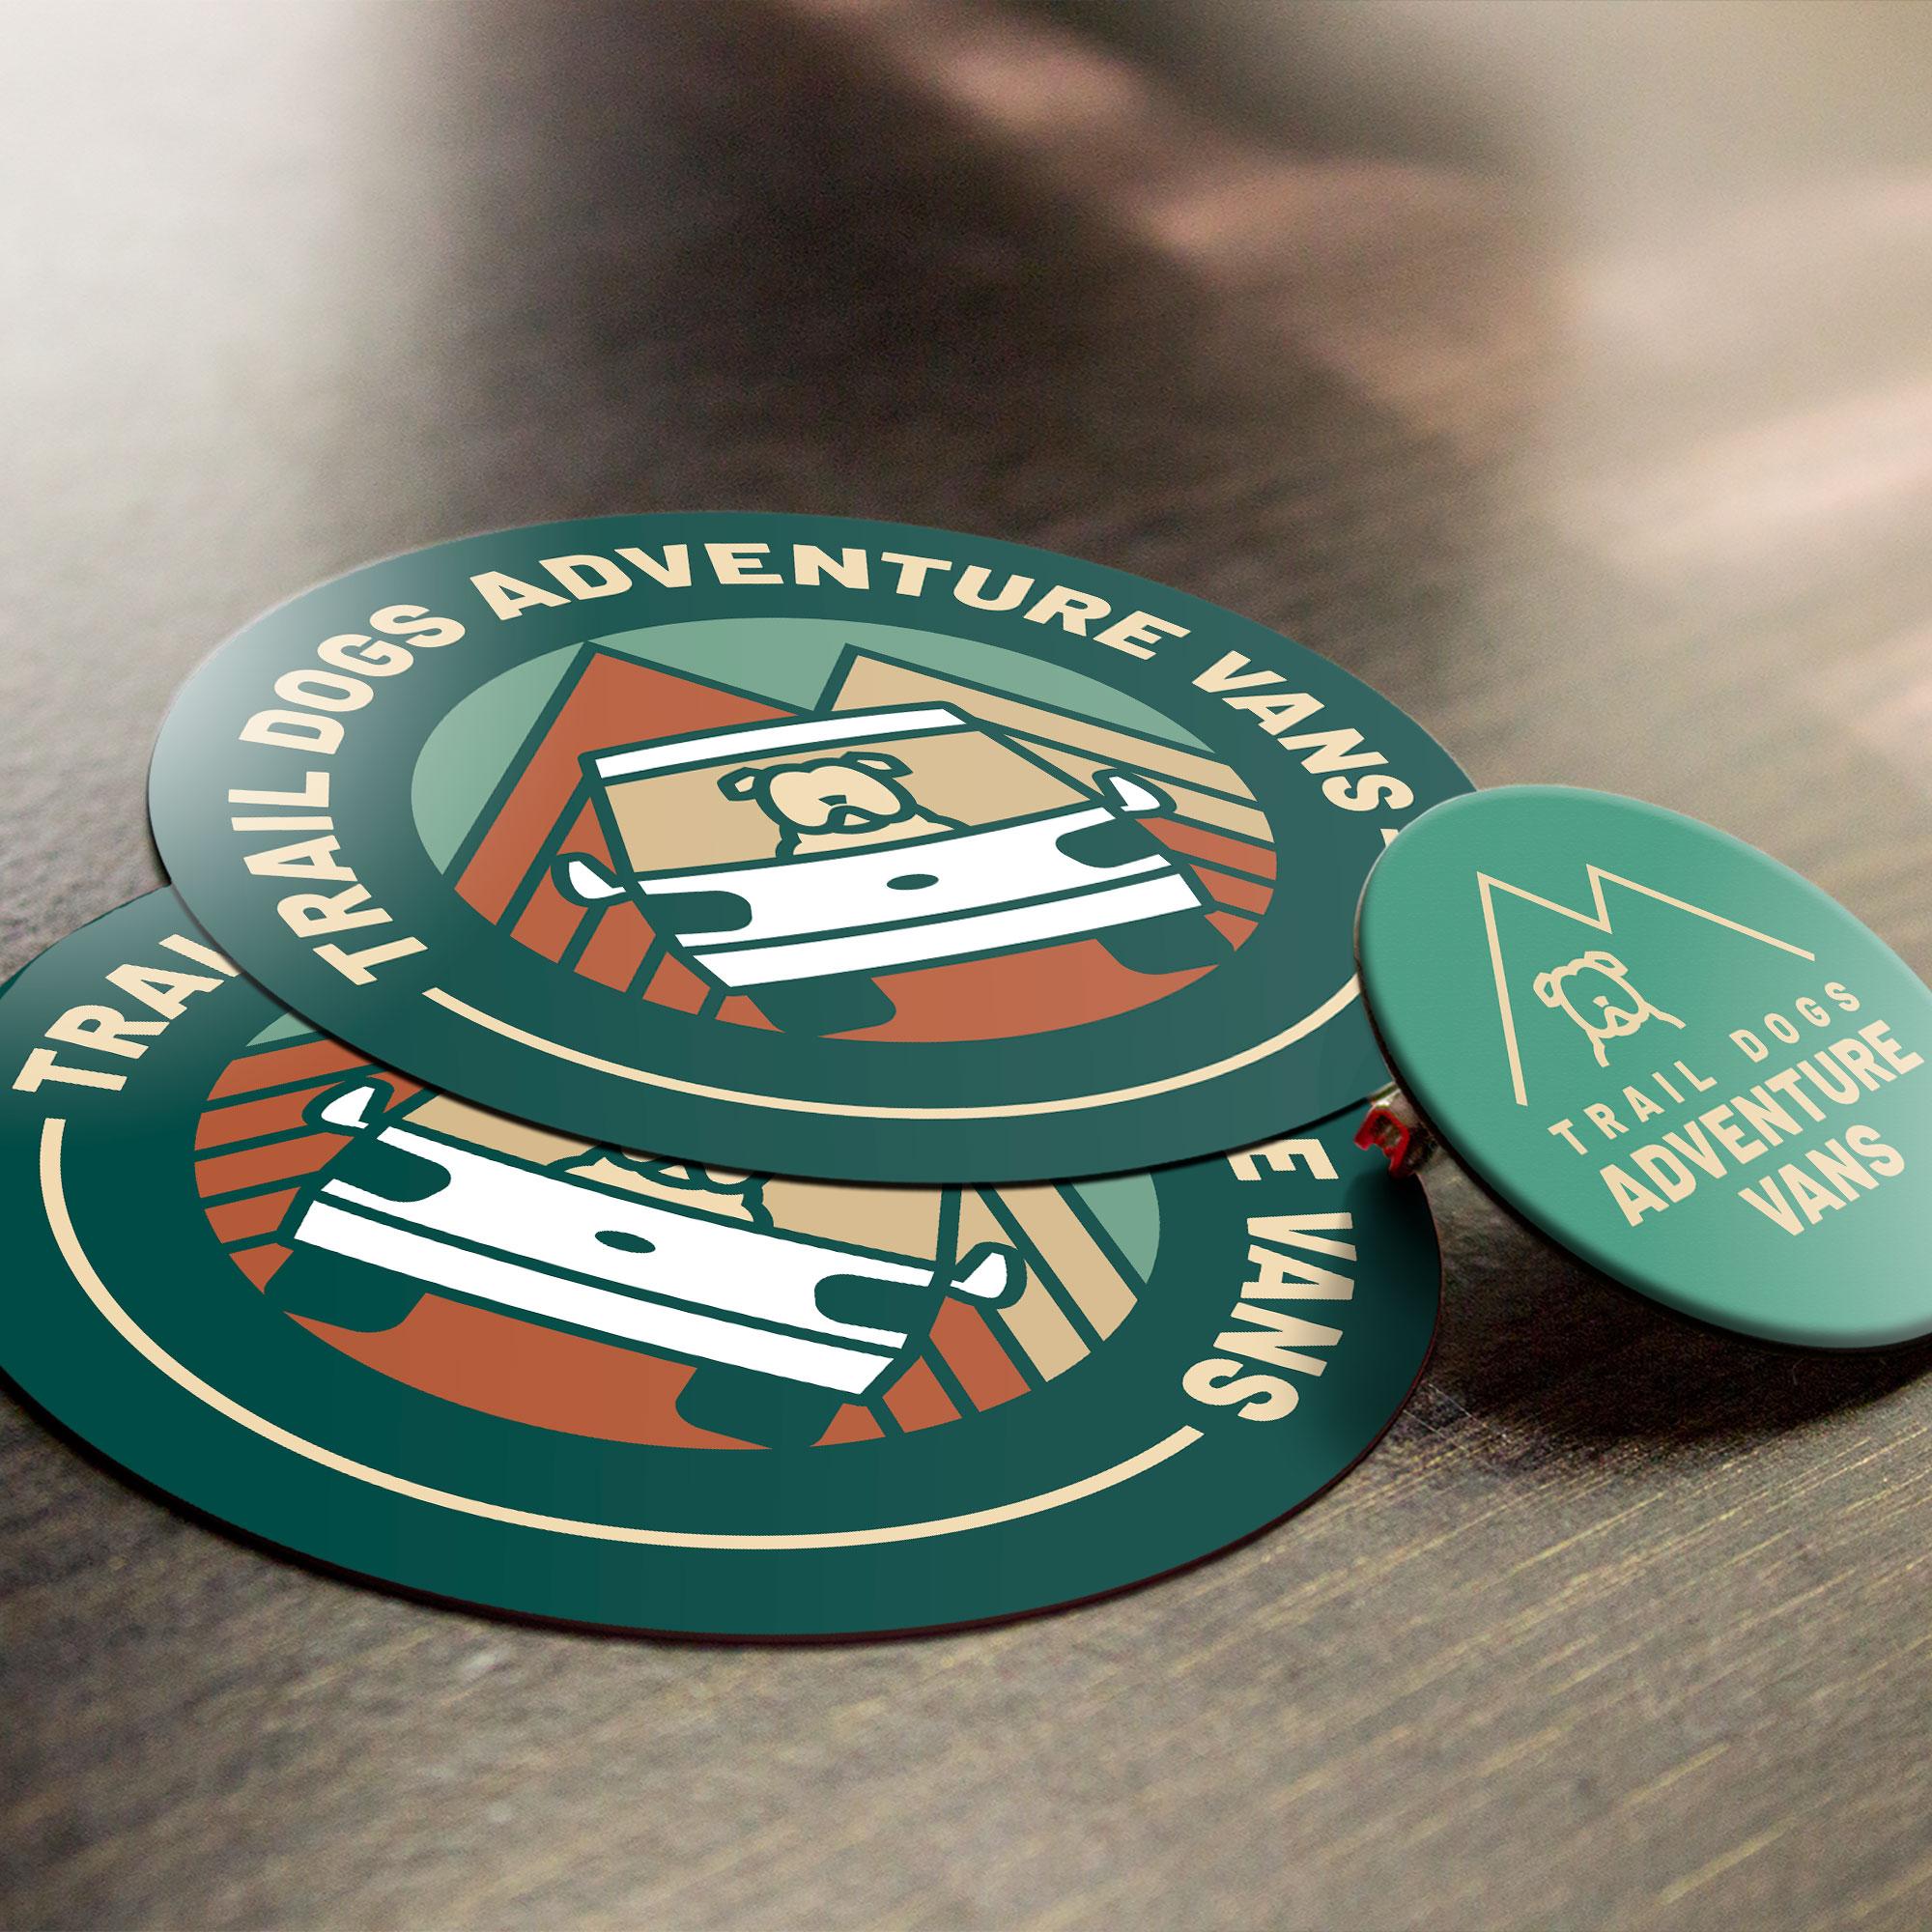 trail-dogs-adventure-vans-sticker-pin.jpg